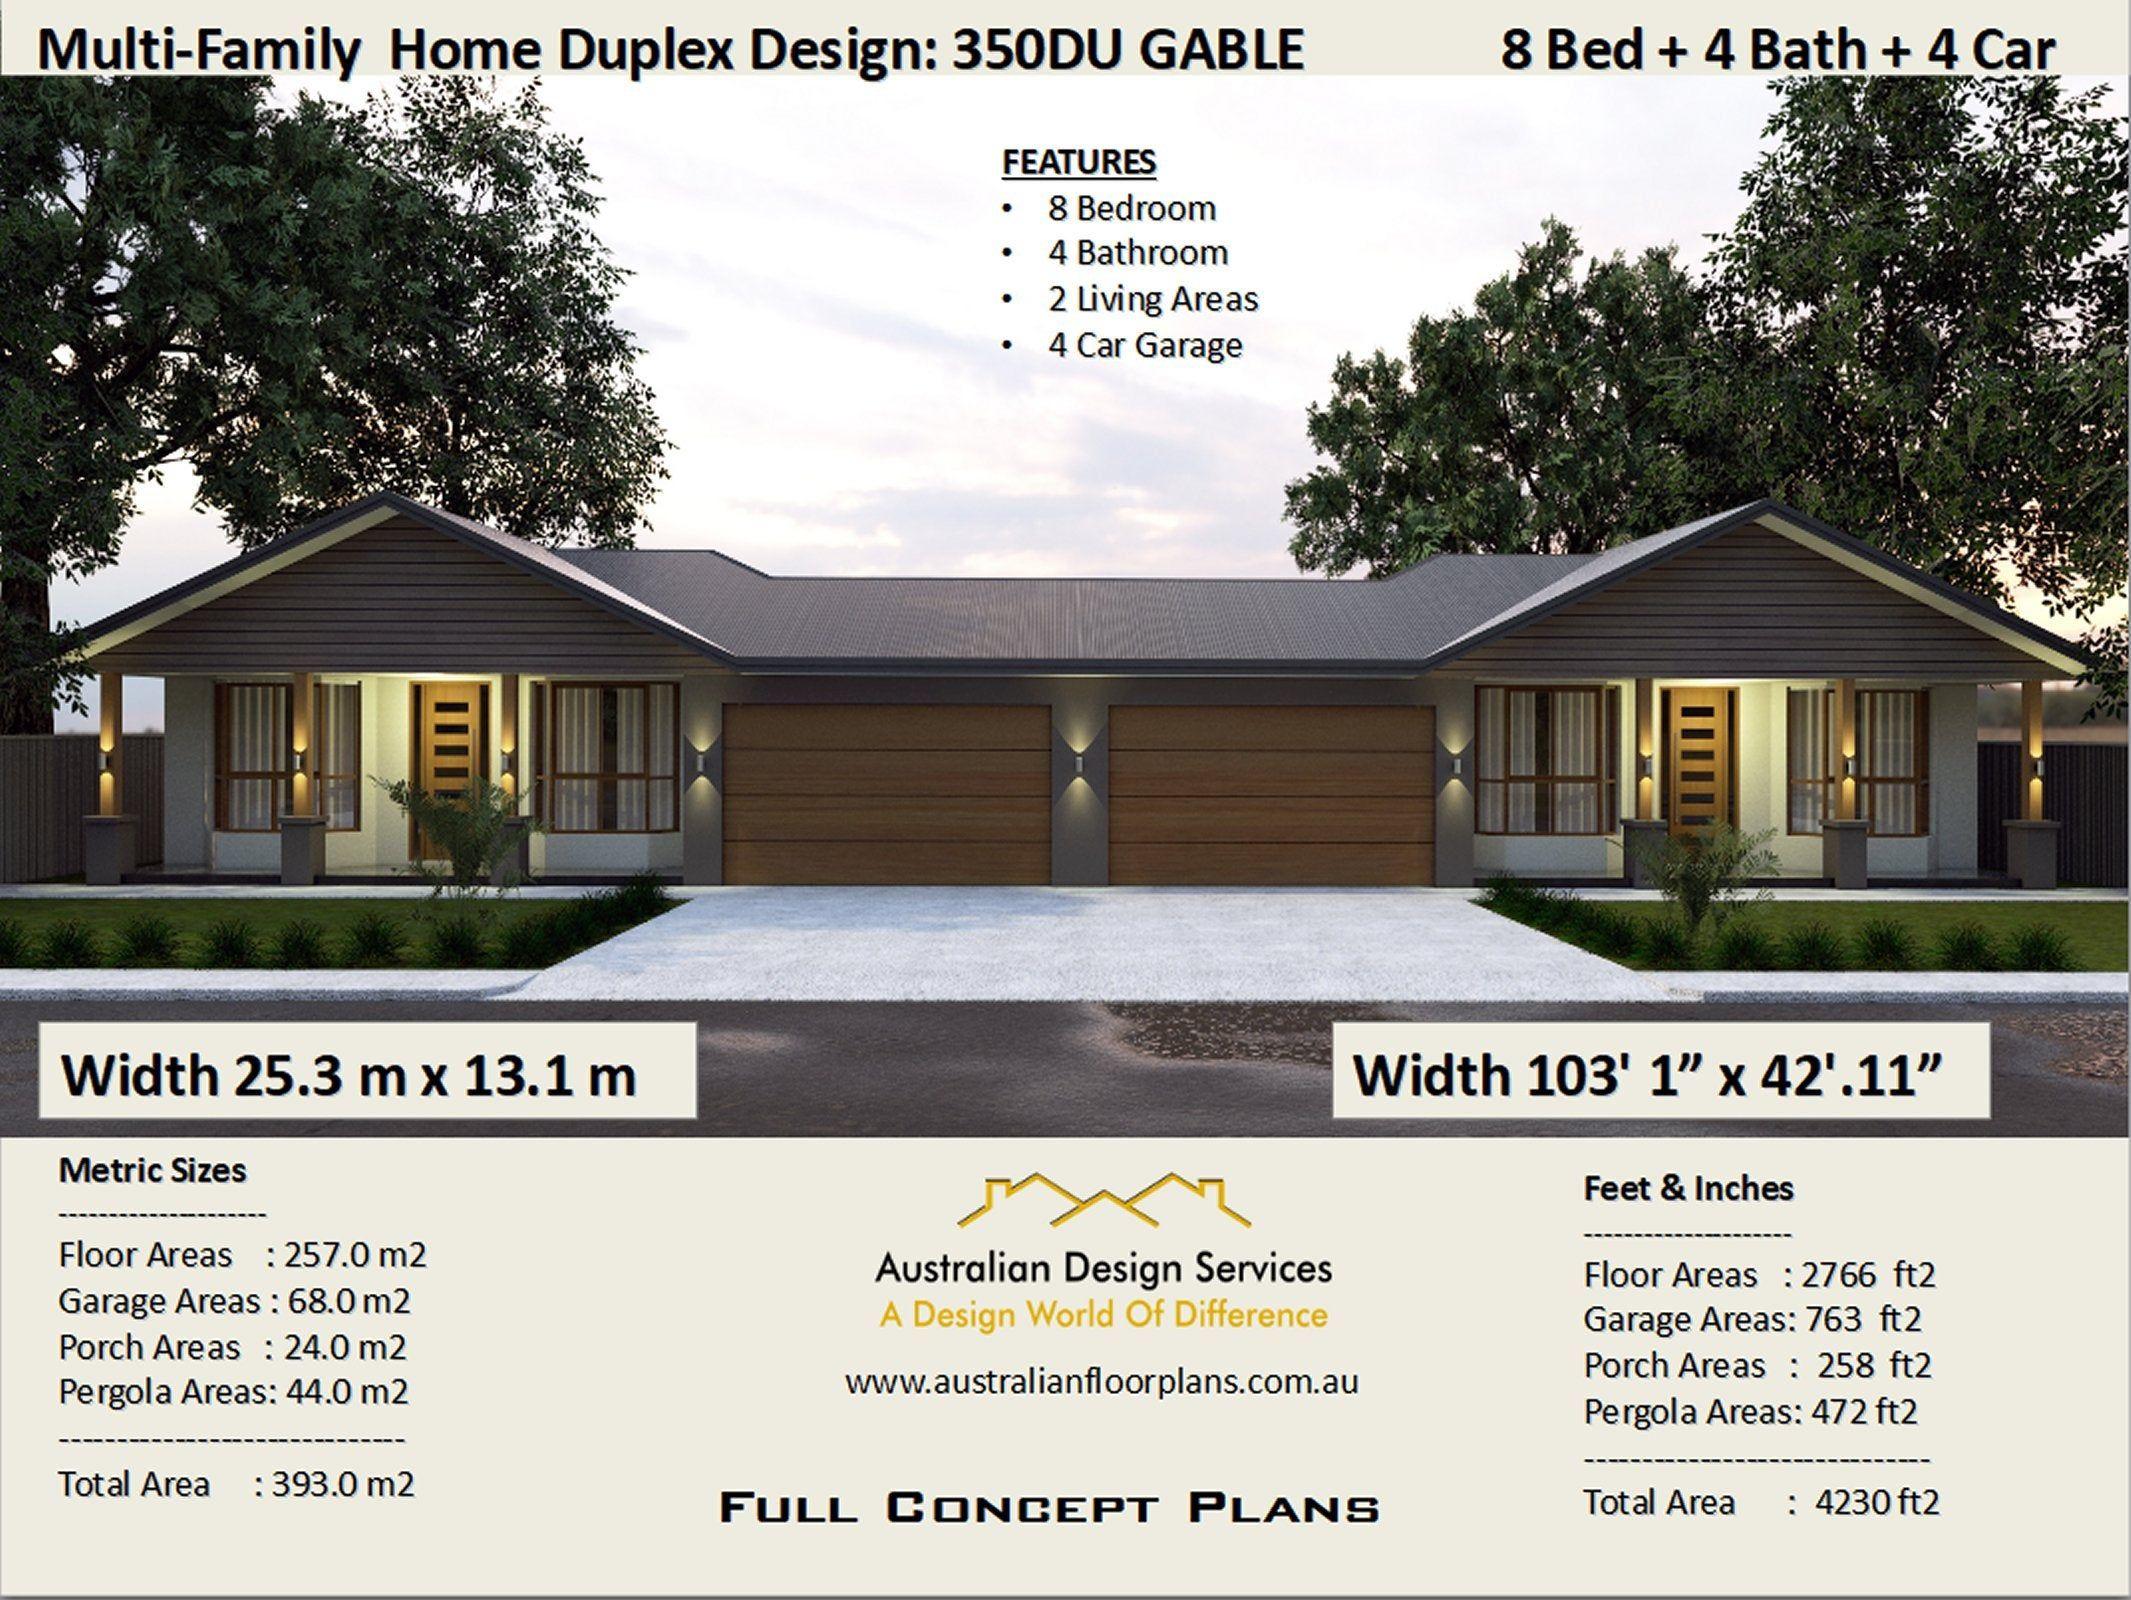 Multi Family Duplex House Plans 8 Bedroom Home Modern Duplex Etsy In 2021 Duplex House Plans House Plans For Sale Duplex Design